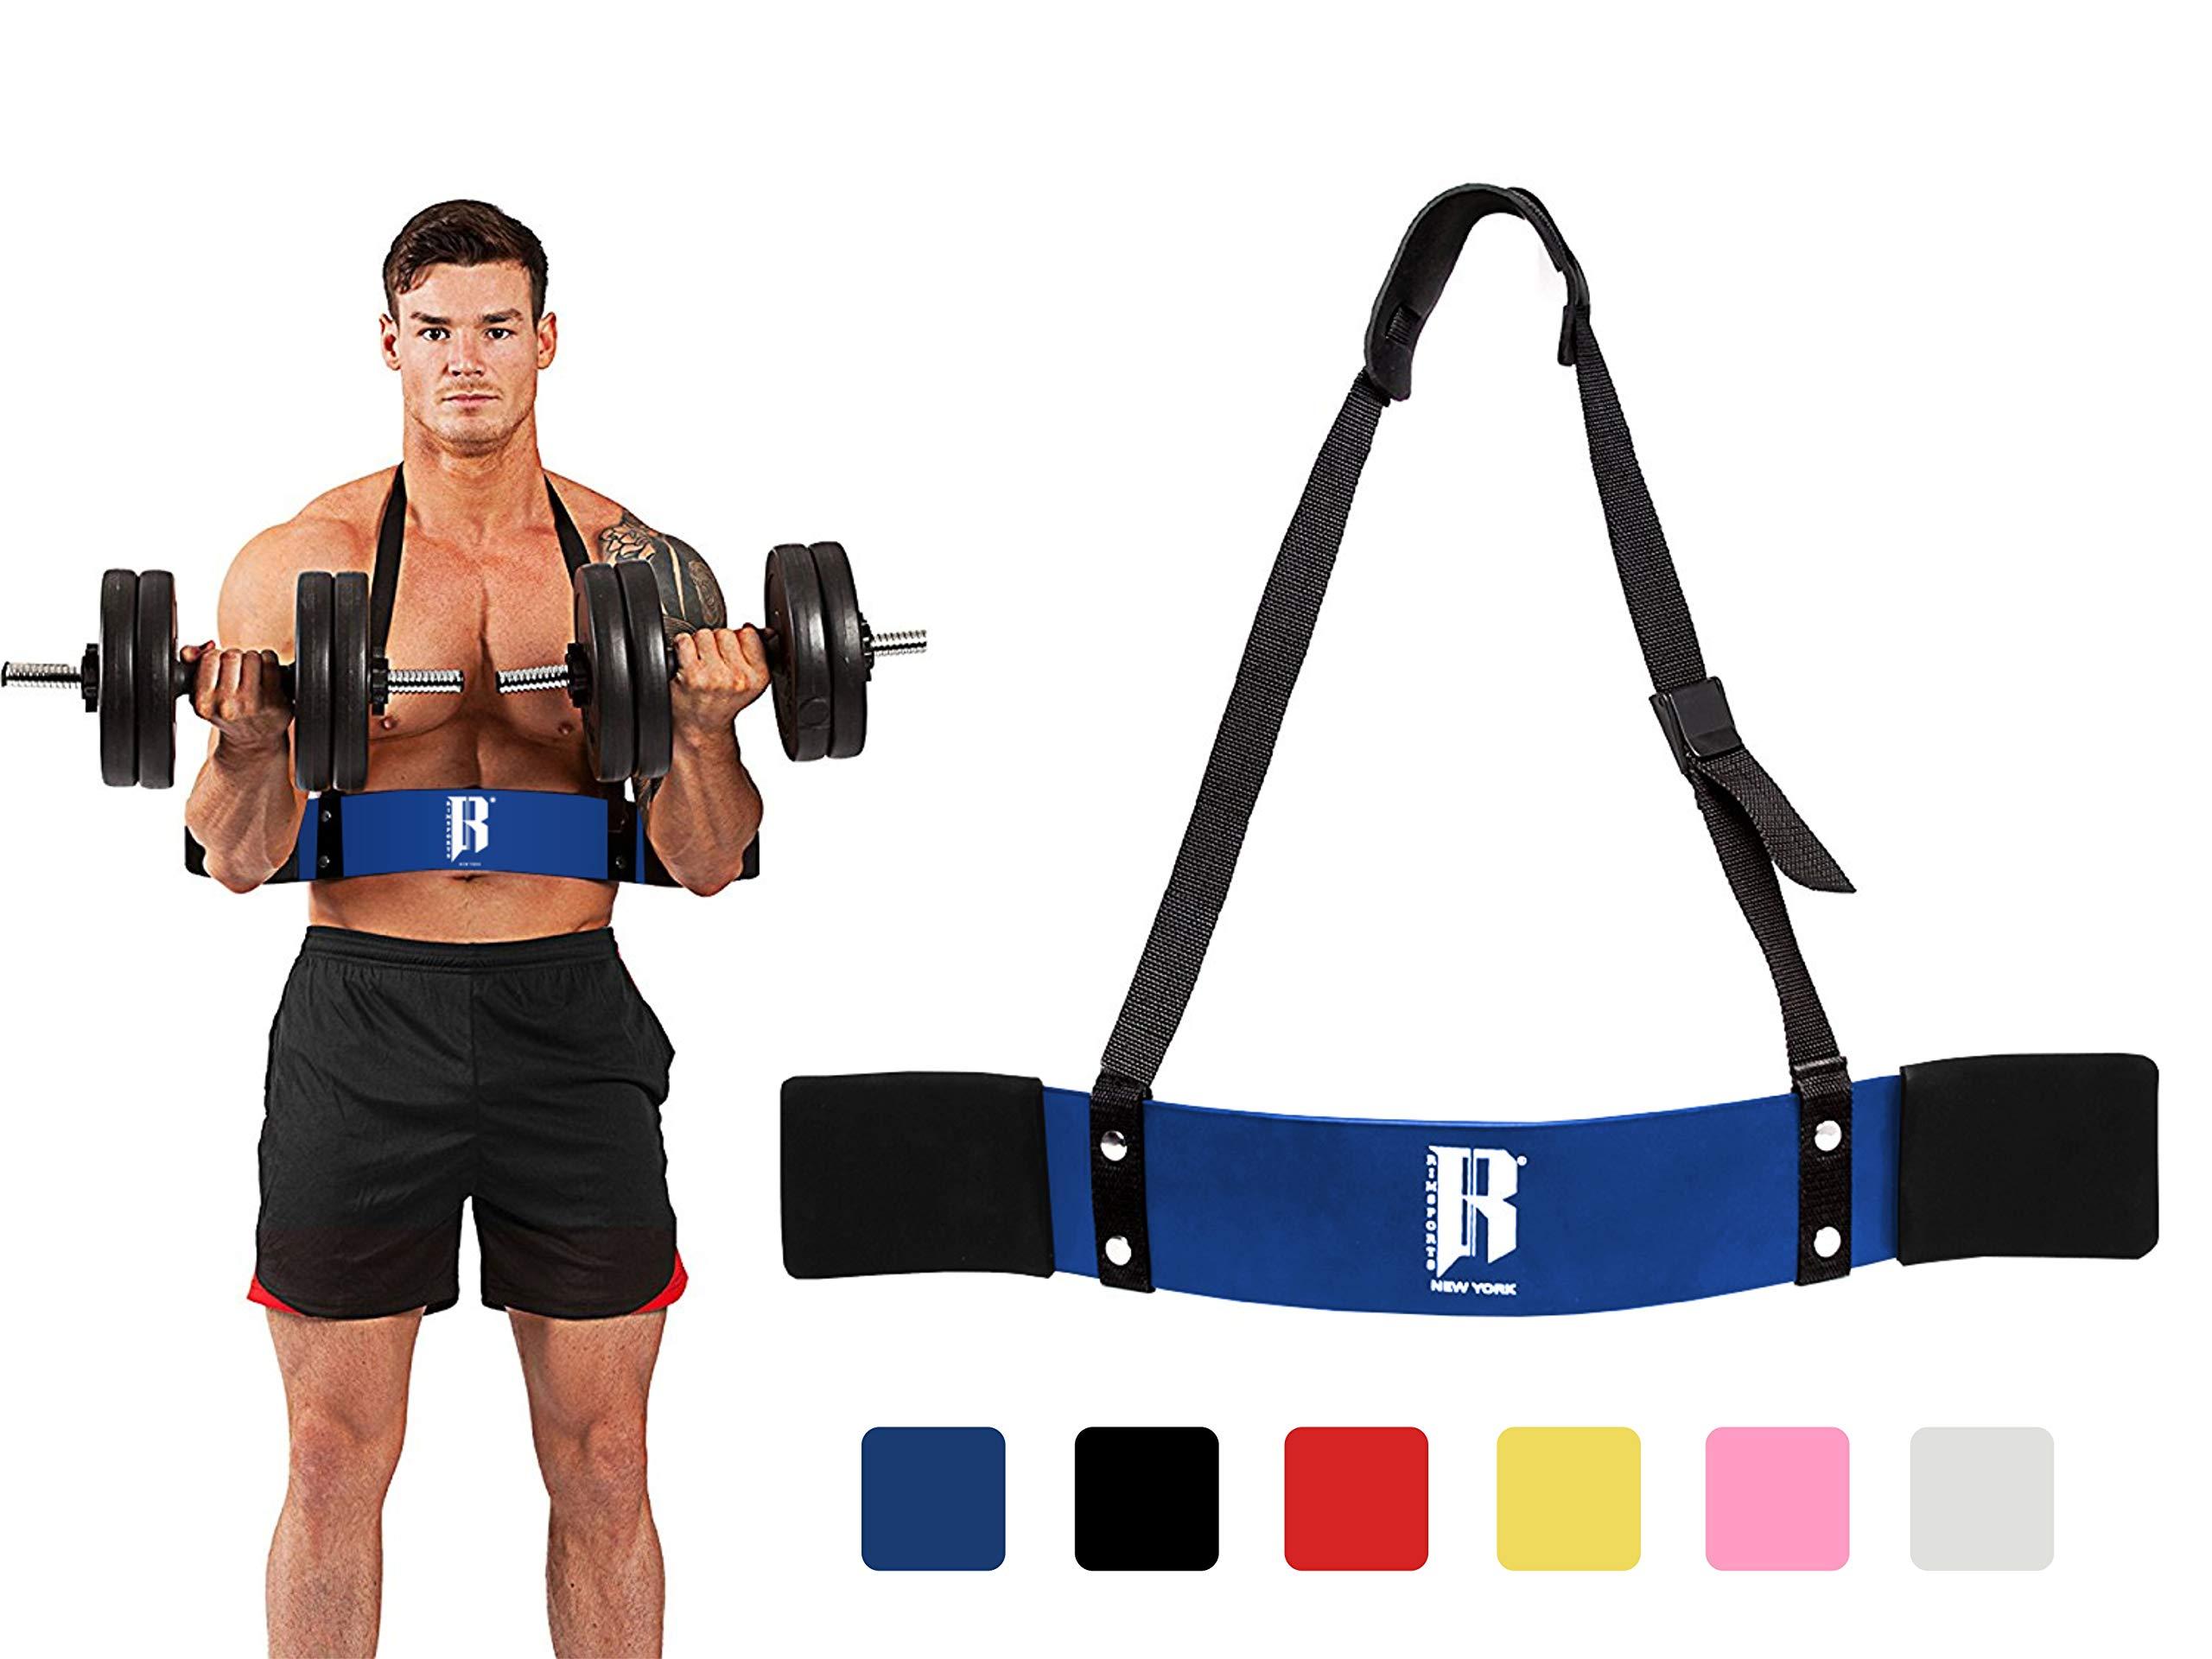 RIMSports Arm Blaster for Biceps Best Muscle Bicep Blaster for Bicep and Tricep Workout Ideal Biceps Isolator & Heavy Duty Elite Muscle Arm Blaster for Bodybuilders & Weightlifters (Blue)